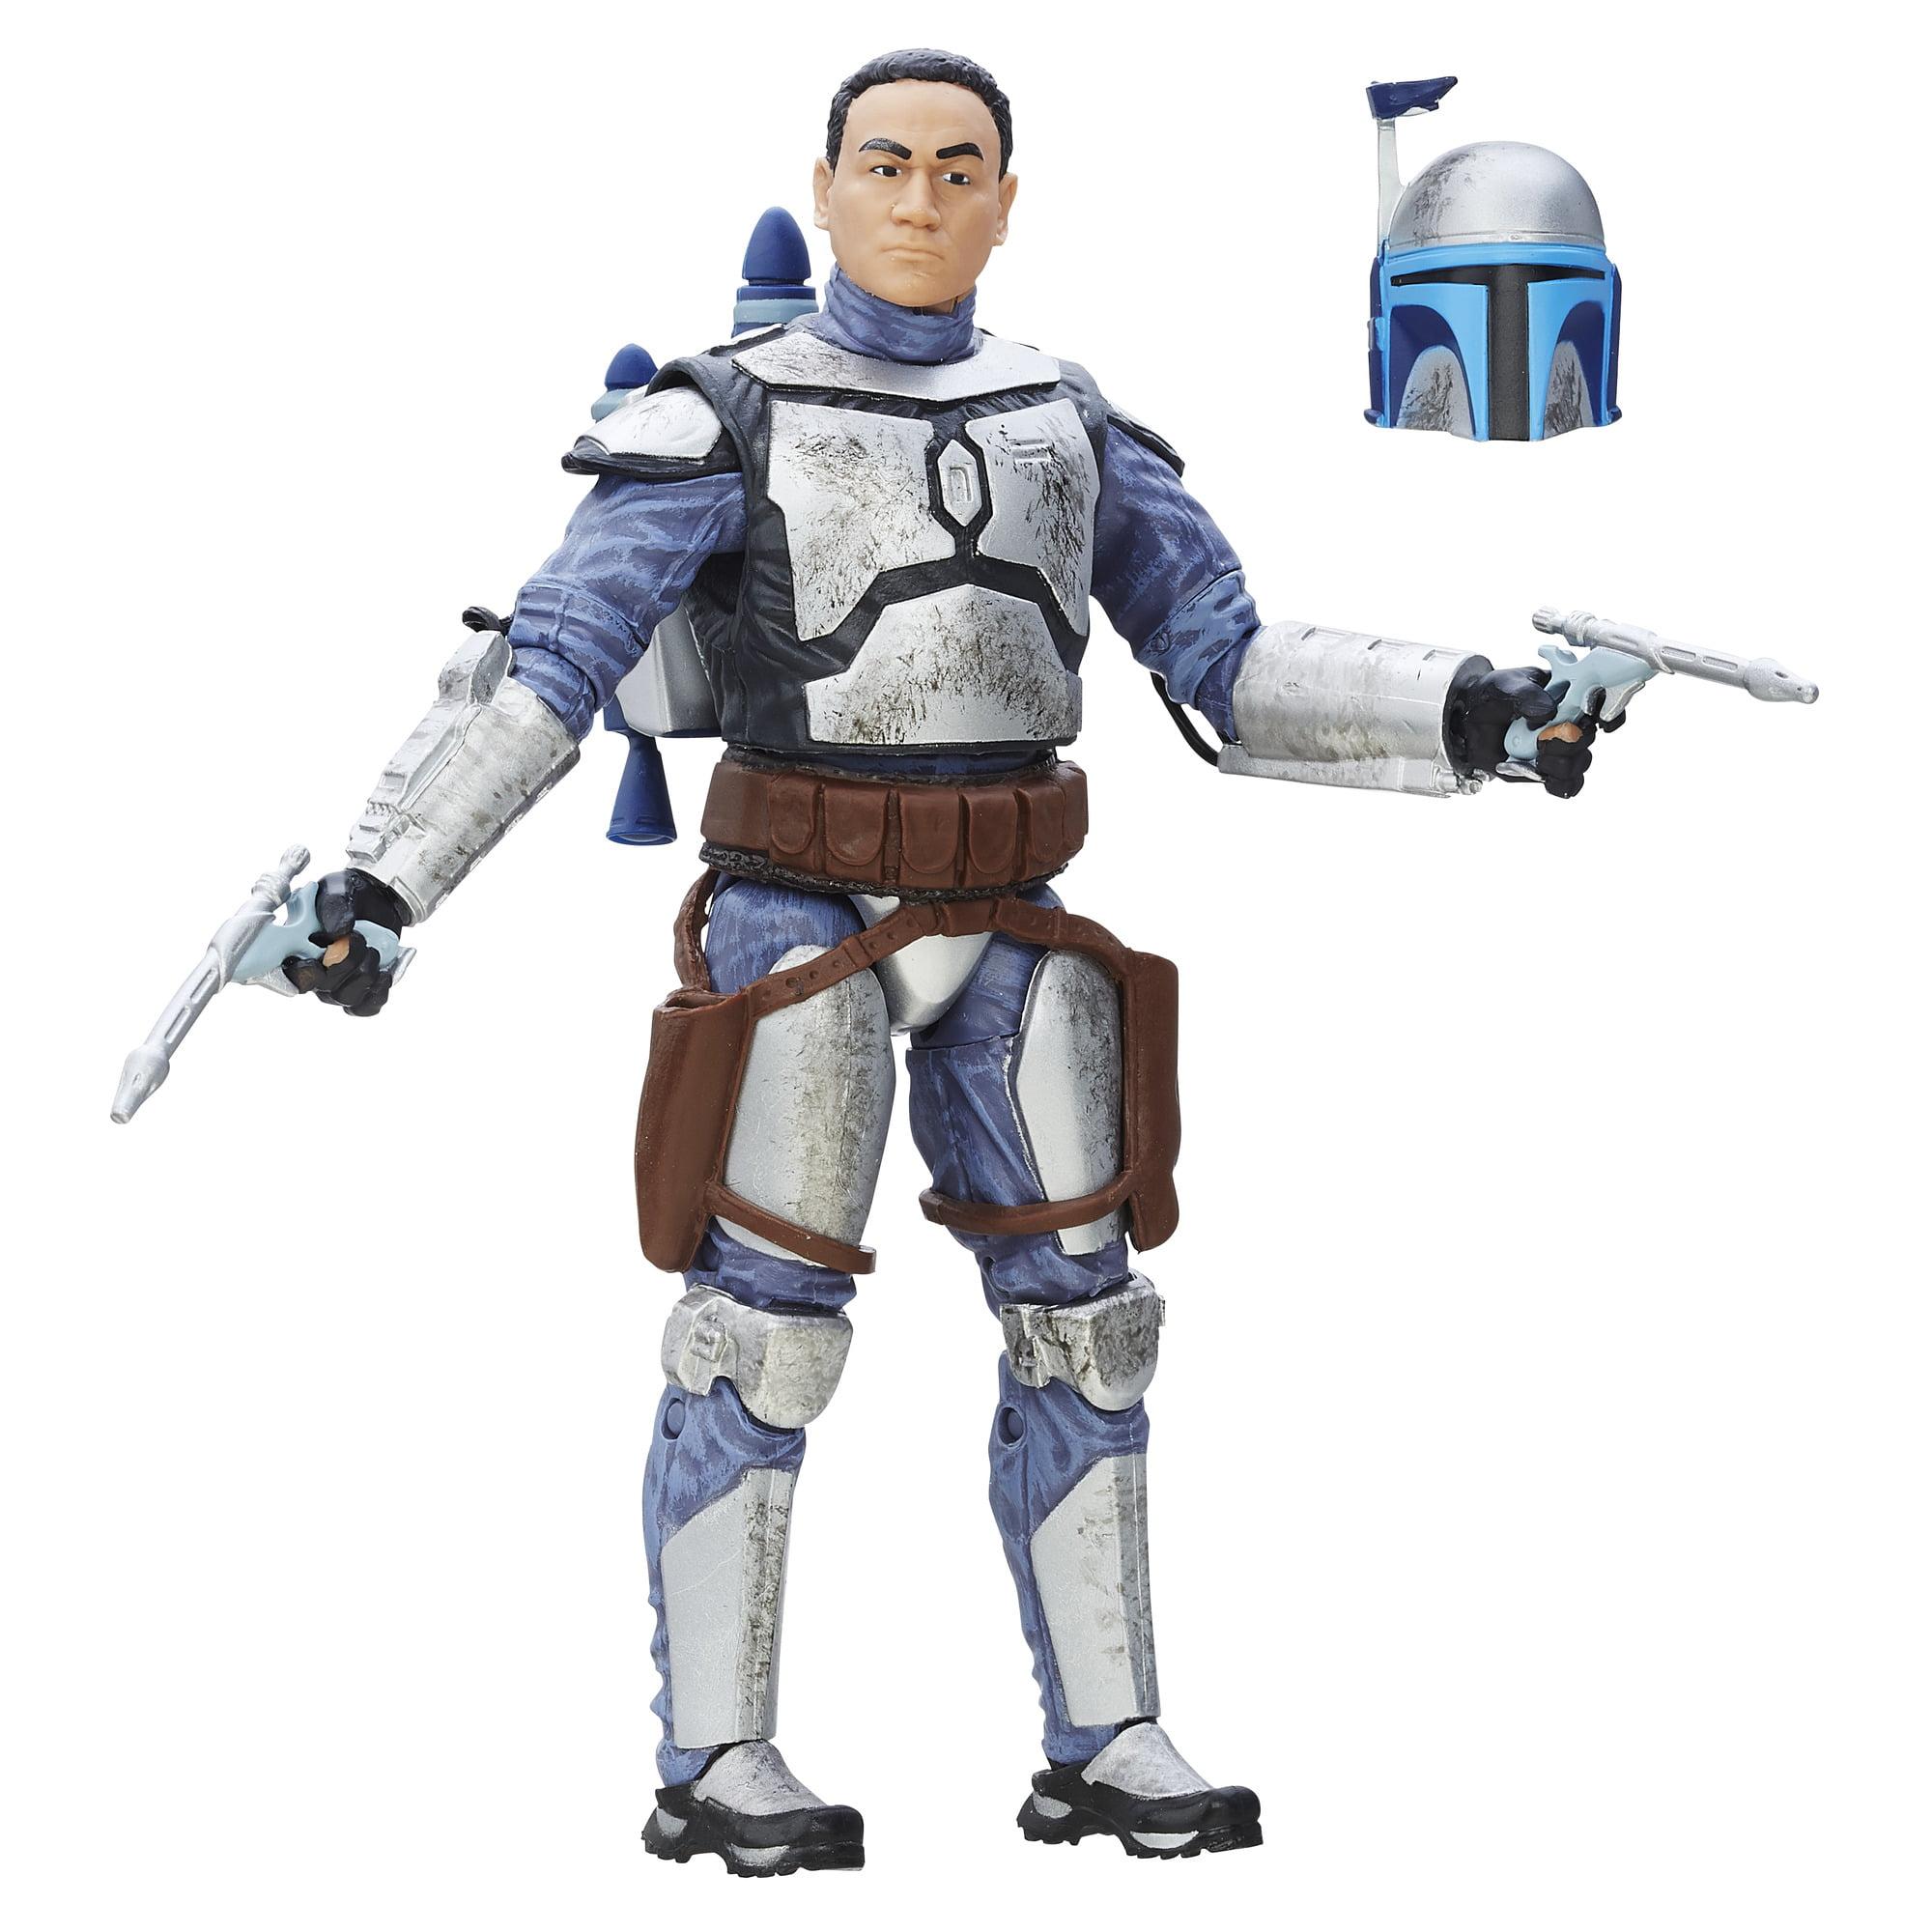 Star Wars Black Series Jango Fett Action Figure